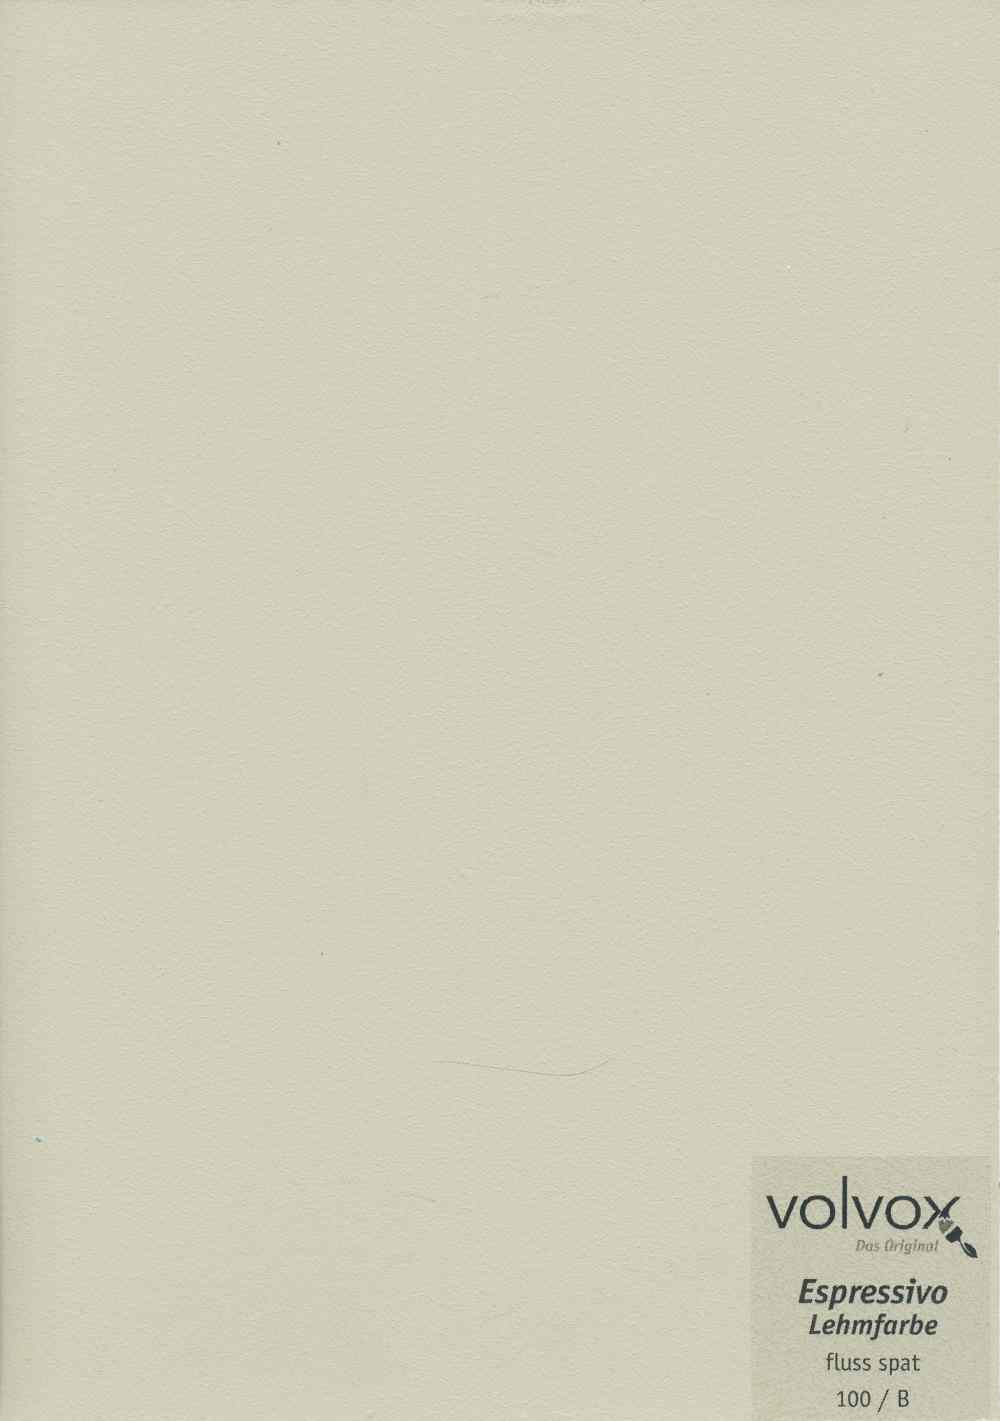 Volvox Espressivo Lehmfarbe 100 fluss spat